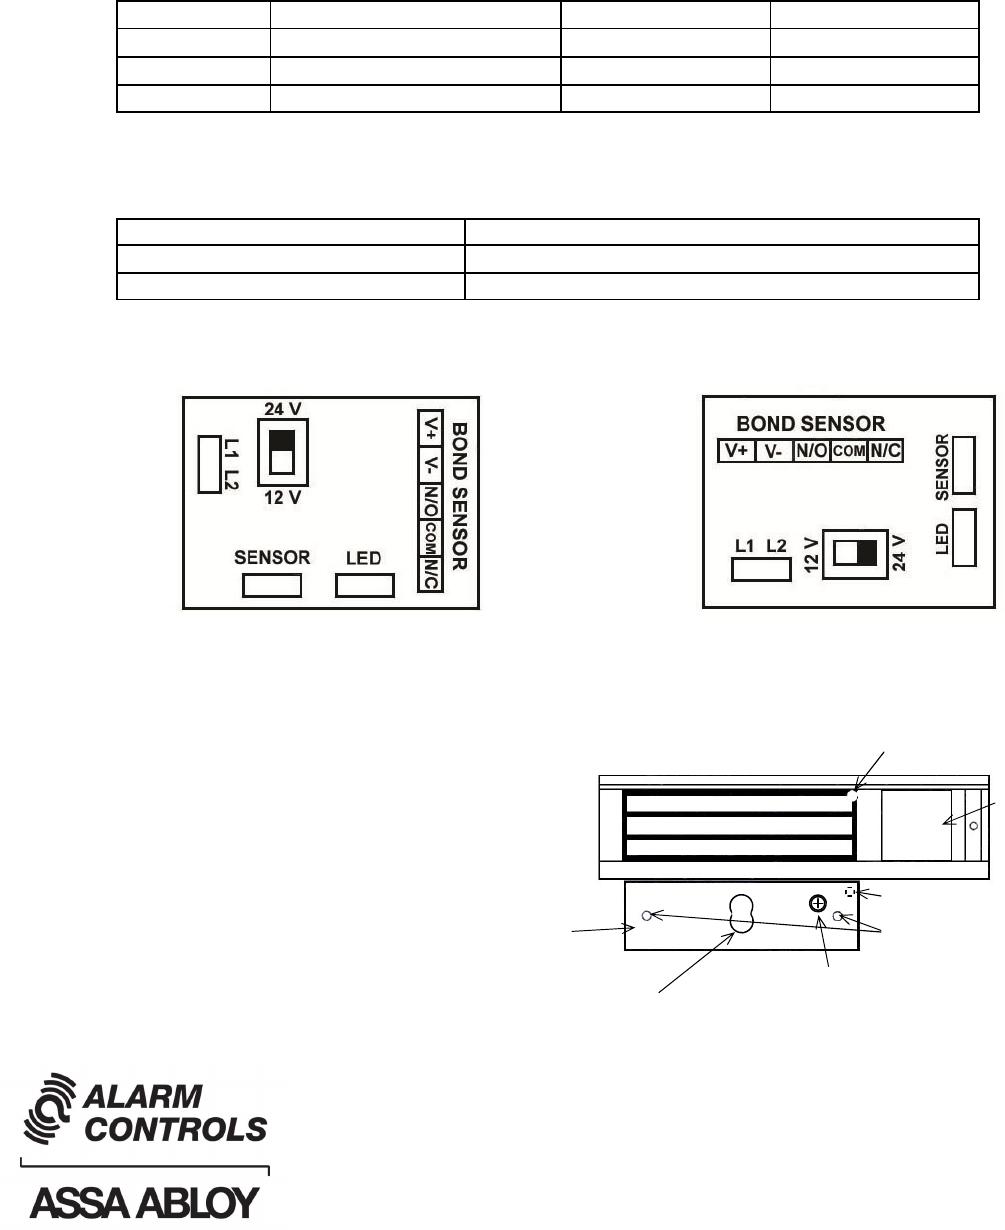 Schlage 390g Mag Lock Wiring Diagram Reveolution Of Locknetics Maglock Scintillating Pir With Photos Automatic Door Schematic